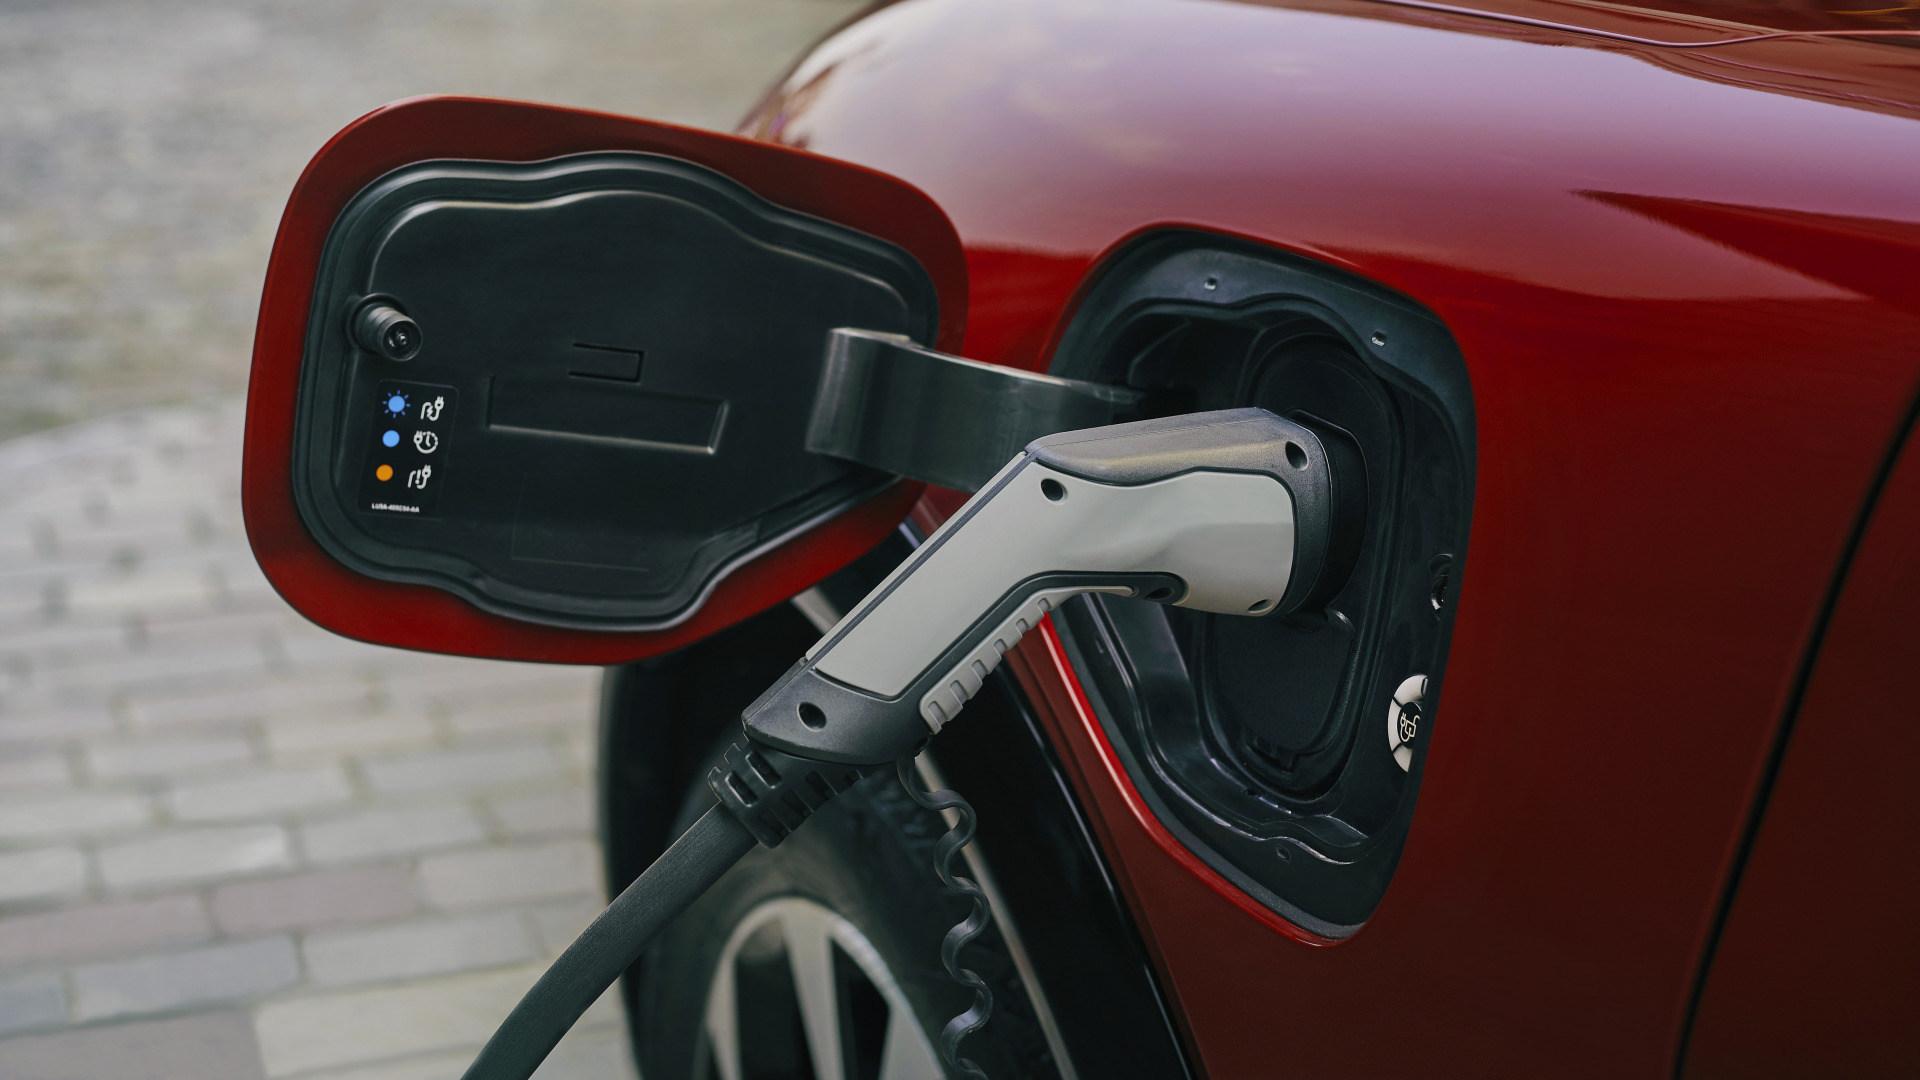 Akku, Auto, Elektroautos, Energie, Batterie, Elektroauto, E-Auto, Laden, Ford, Automobil, Elektroantrieb, Charging, Ford Mustang Mach-E, E-Antrieb